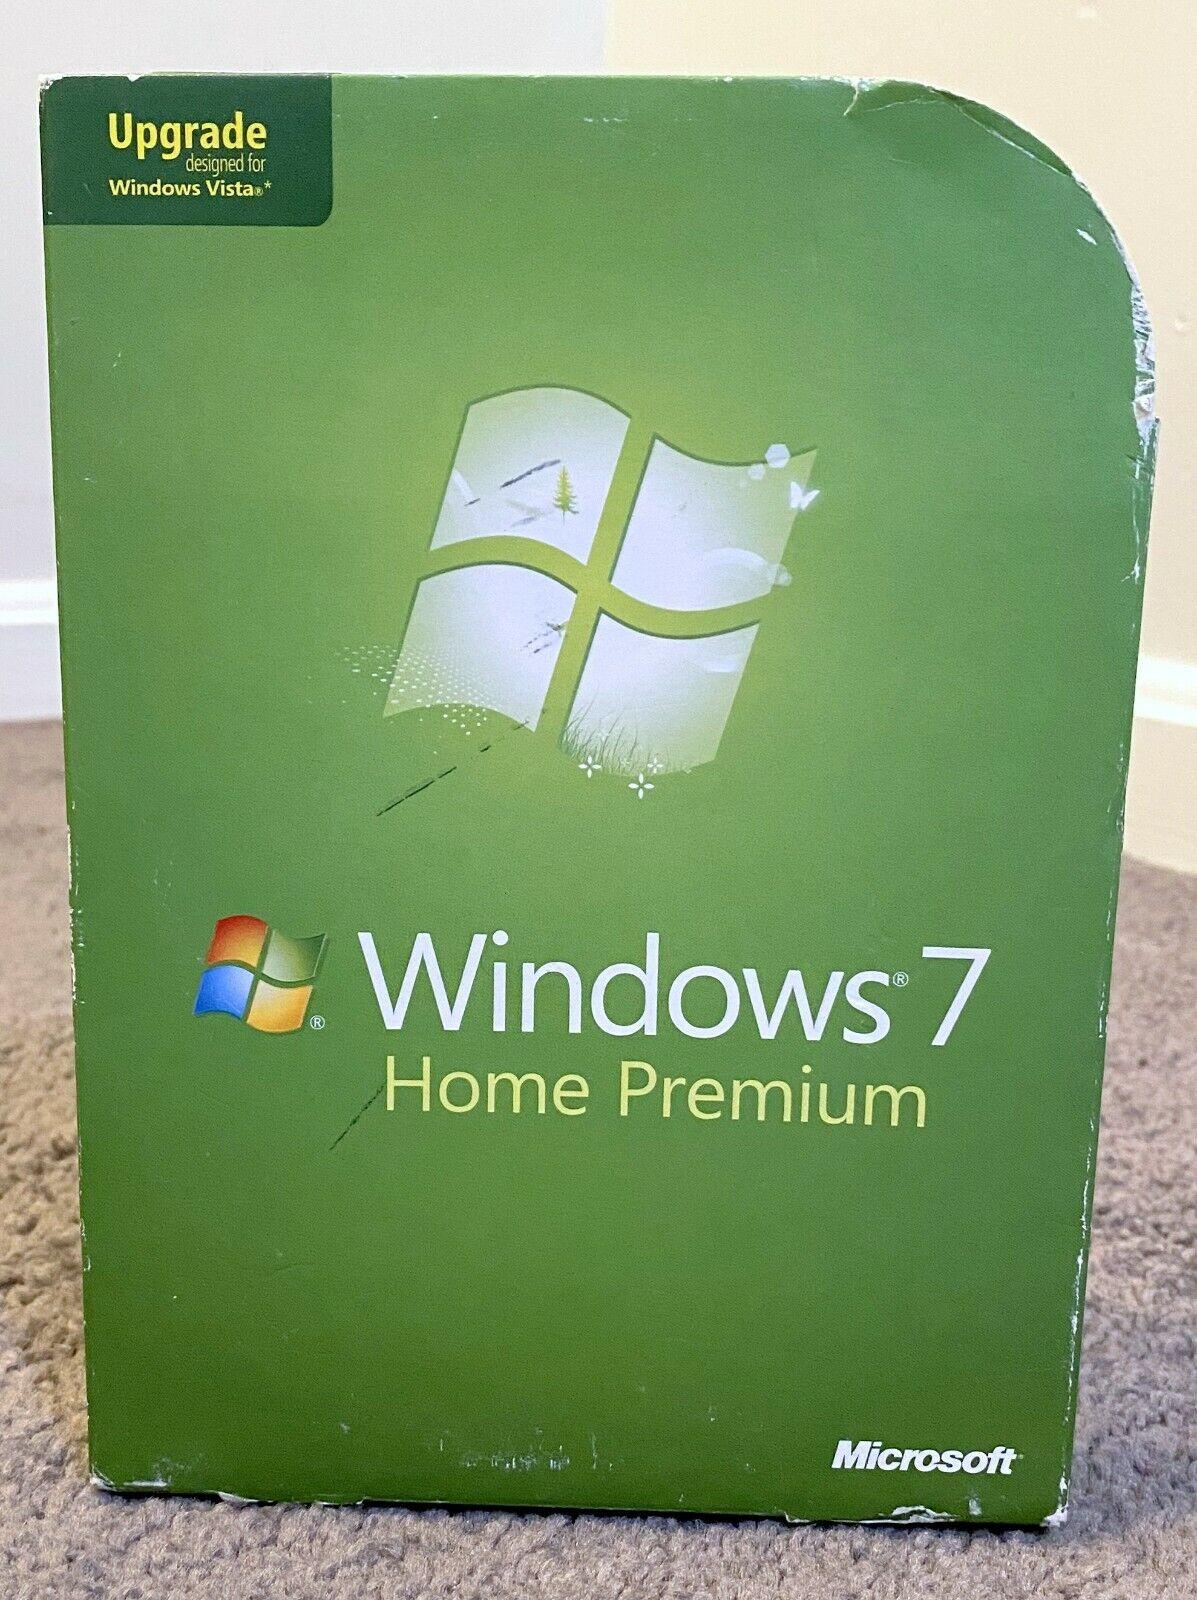 Microsoft Windows 7 Home Premium Upgrade Version For Vista 32 And 64 Bit DVDs - $29.99